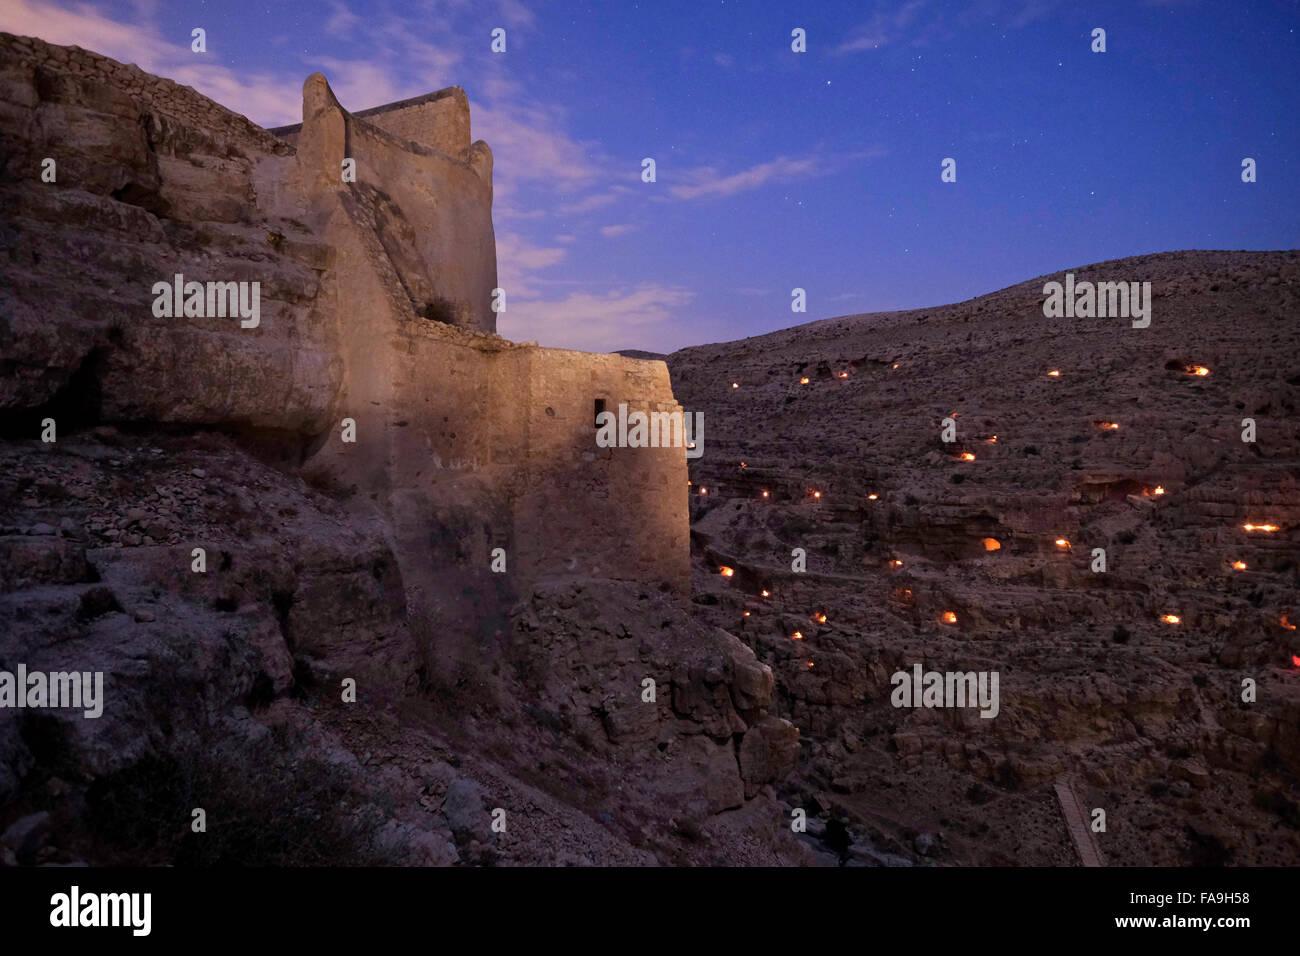 Light candles illuminating small caves near Mar Saba Monastery during Mar Saba Day in the Judaean or Judean desert - Stock Image